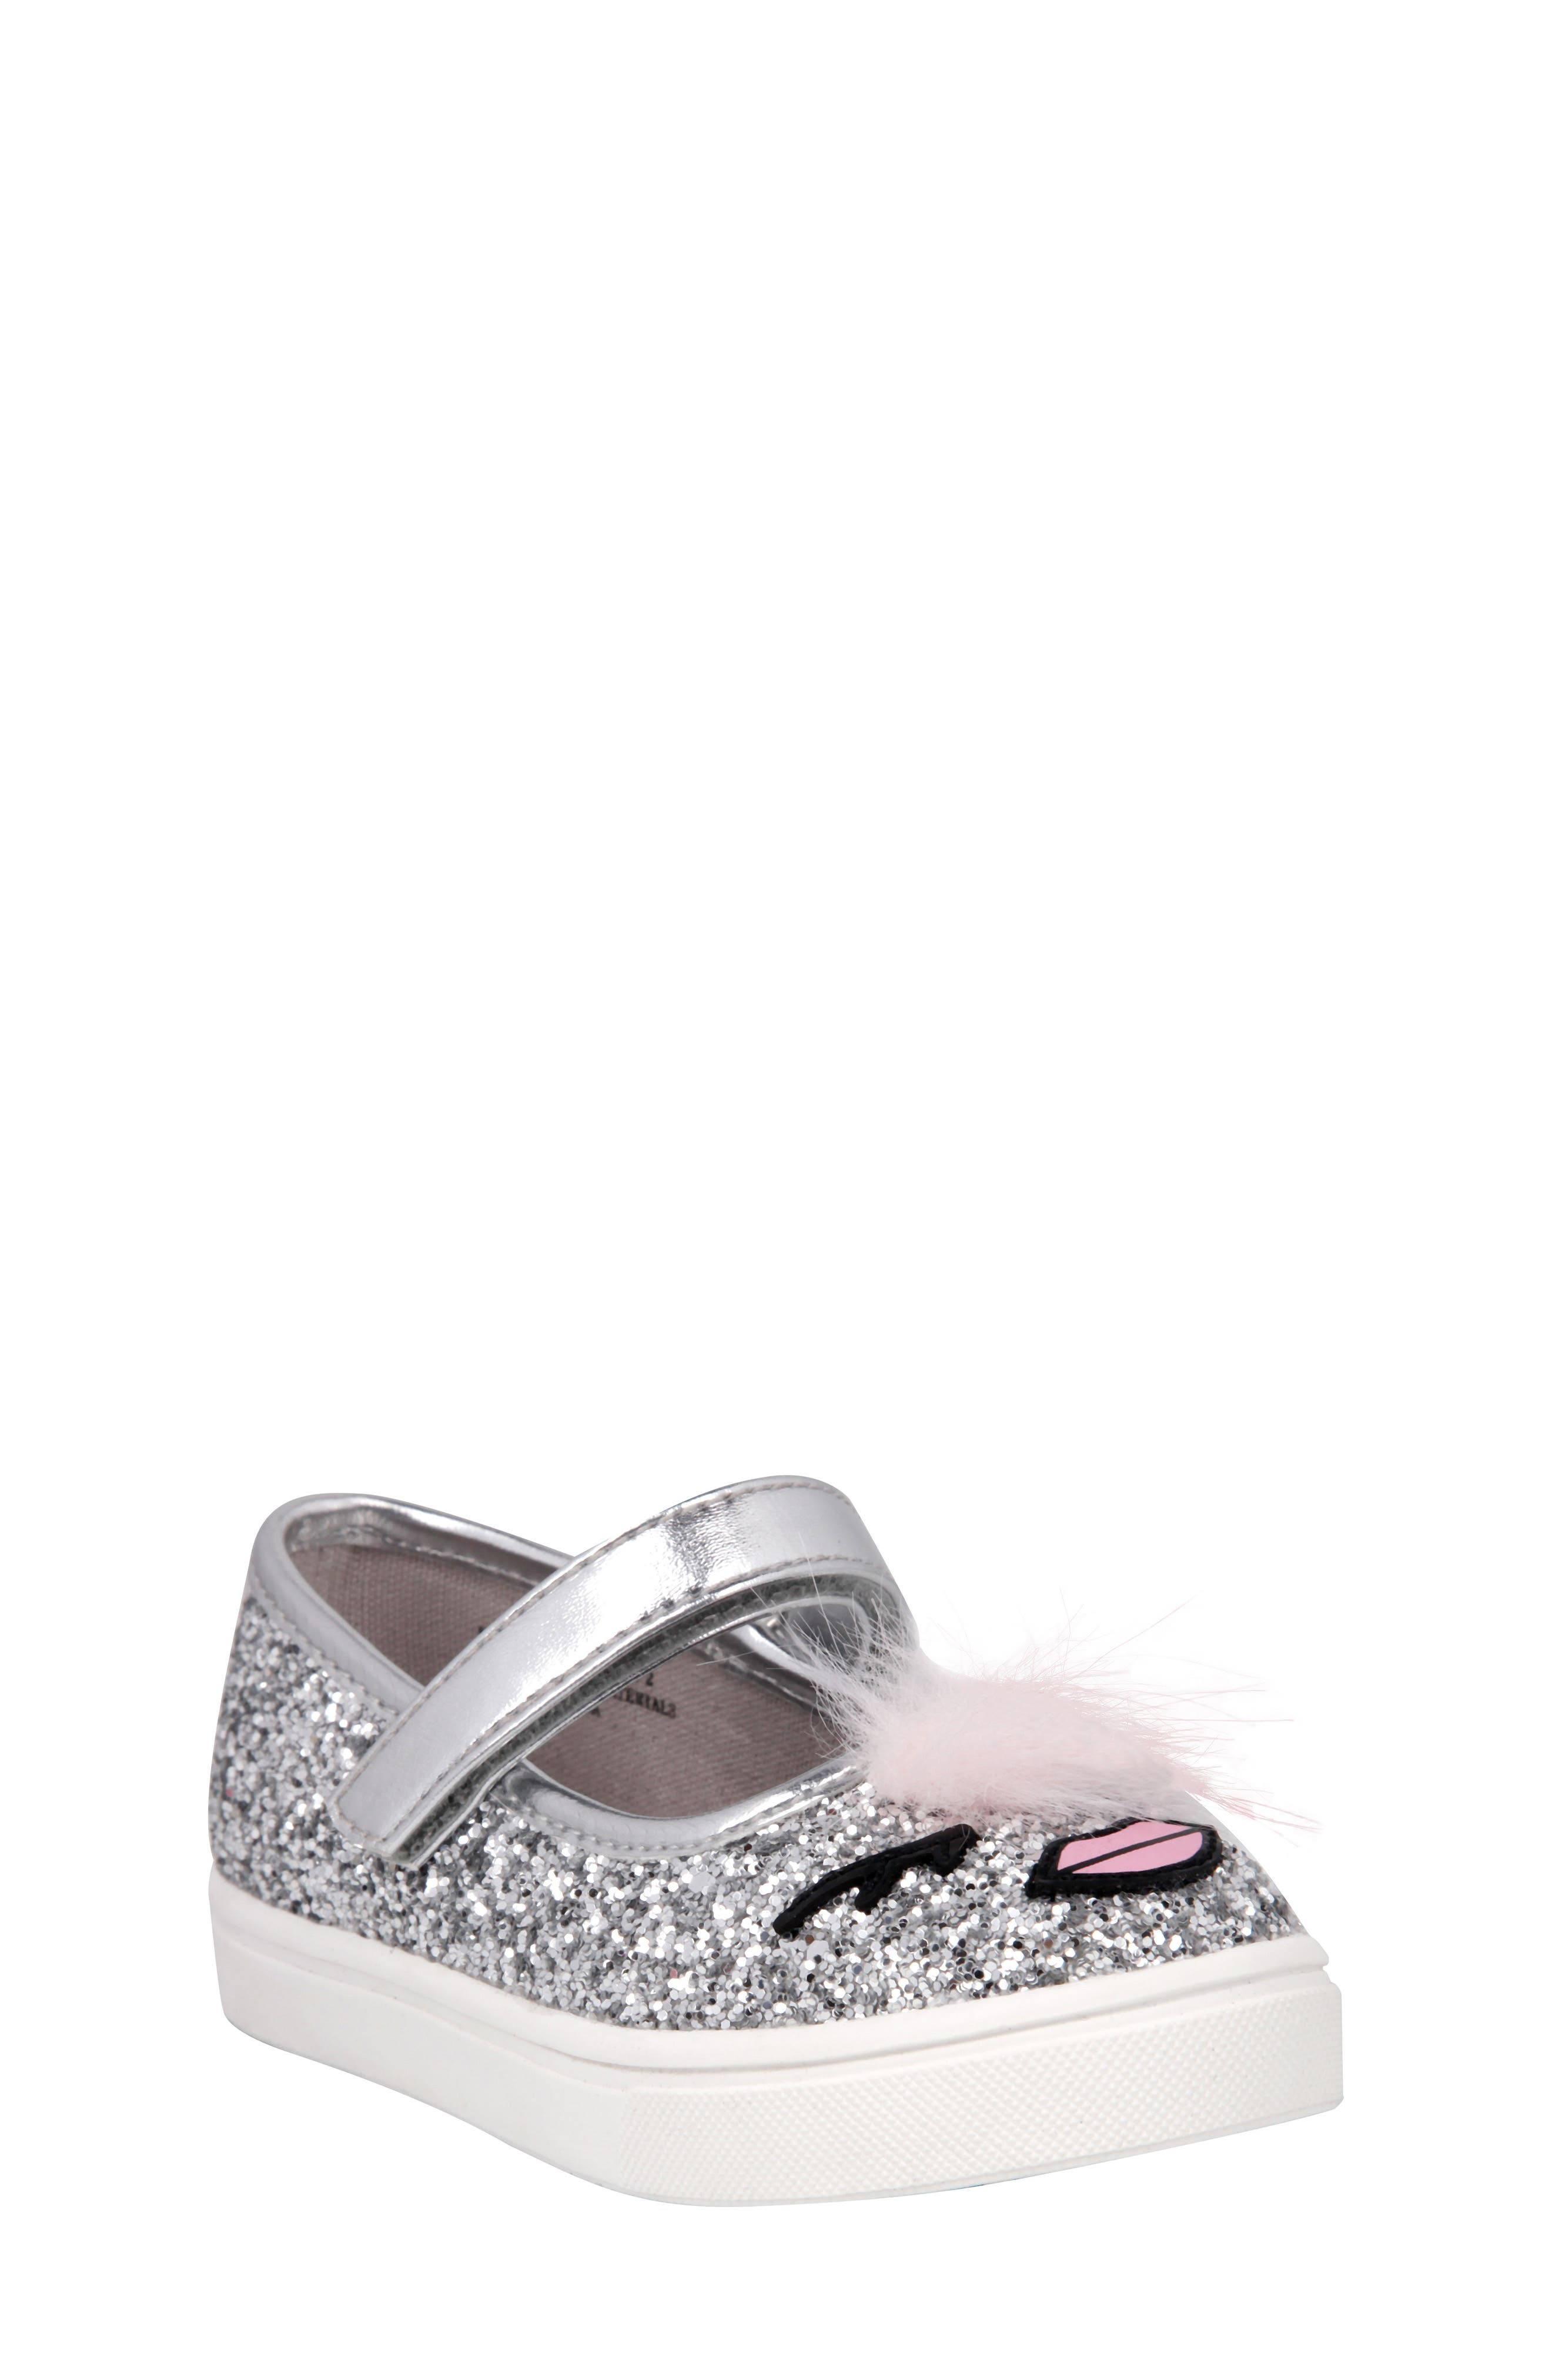 Ragina Faux Fur Glitter Mary Jane Sneaker,                         Main,                         color, 046